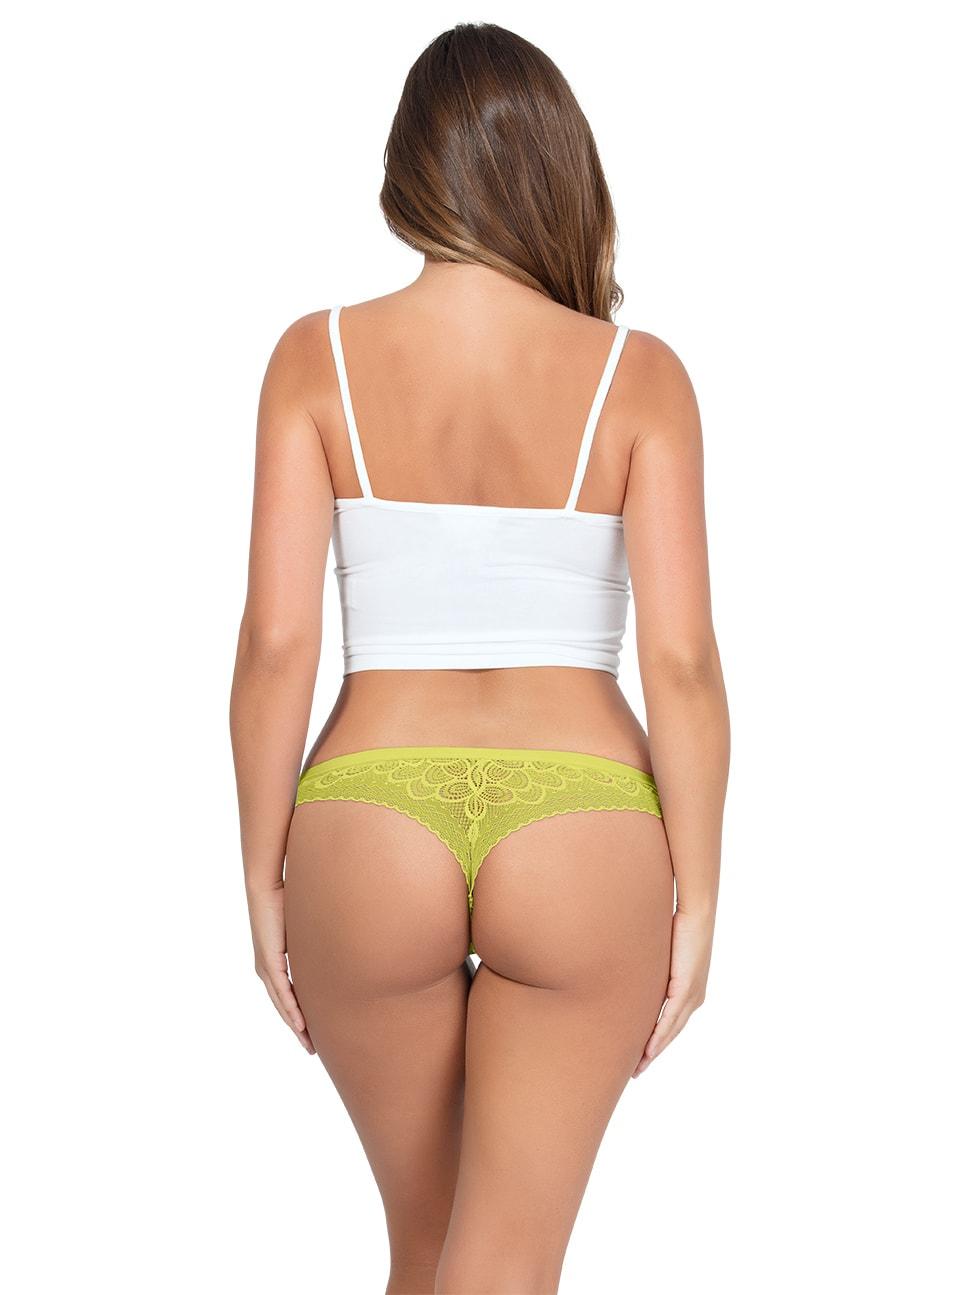 ParfaitPanty SoGlam ThongPP402 Lemonade Back copy - Panty So Glam Thong - Lemonade - PP402